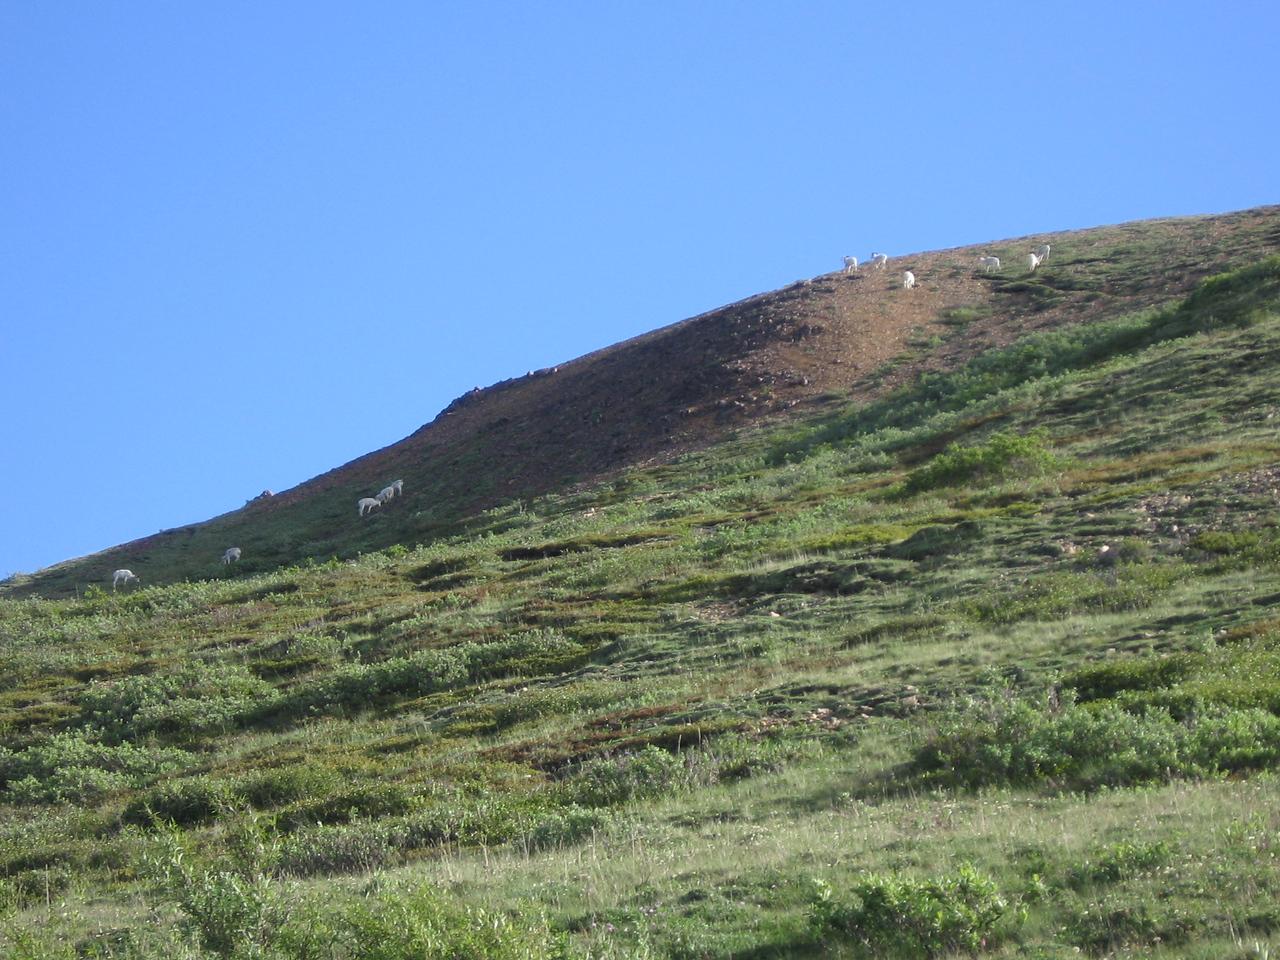 Mountain Goats again